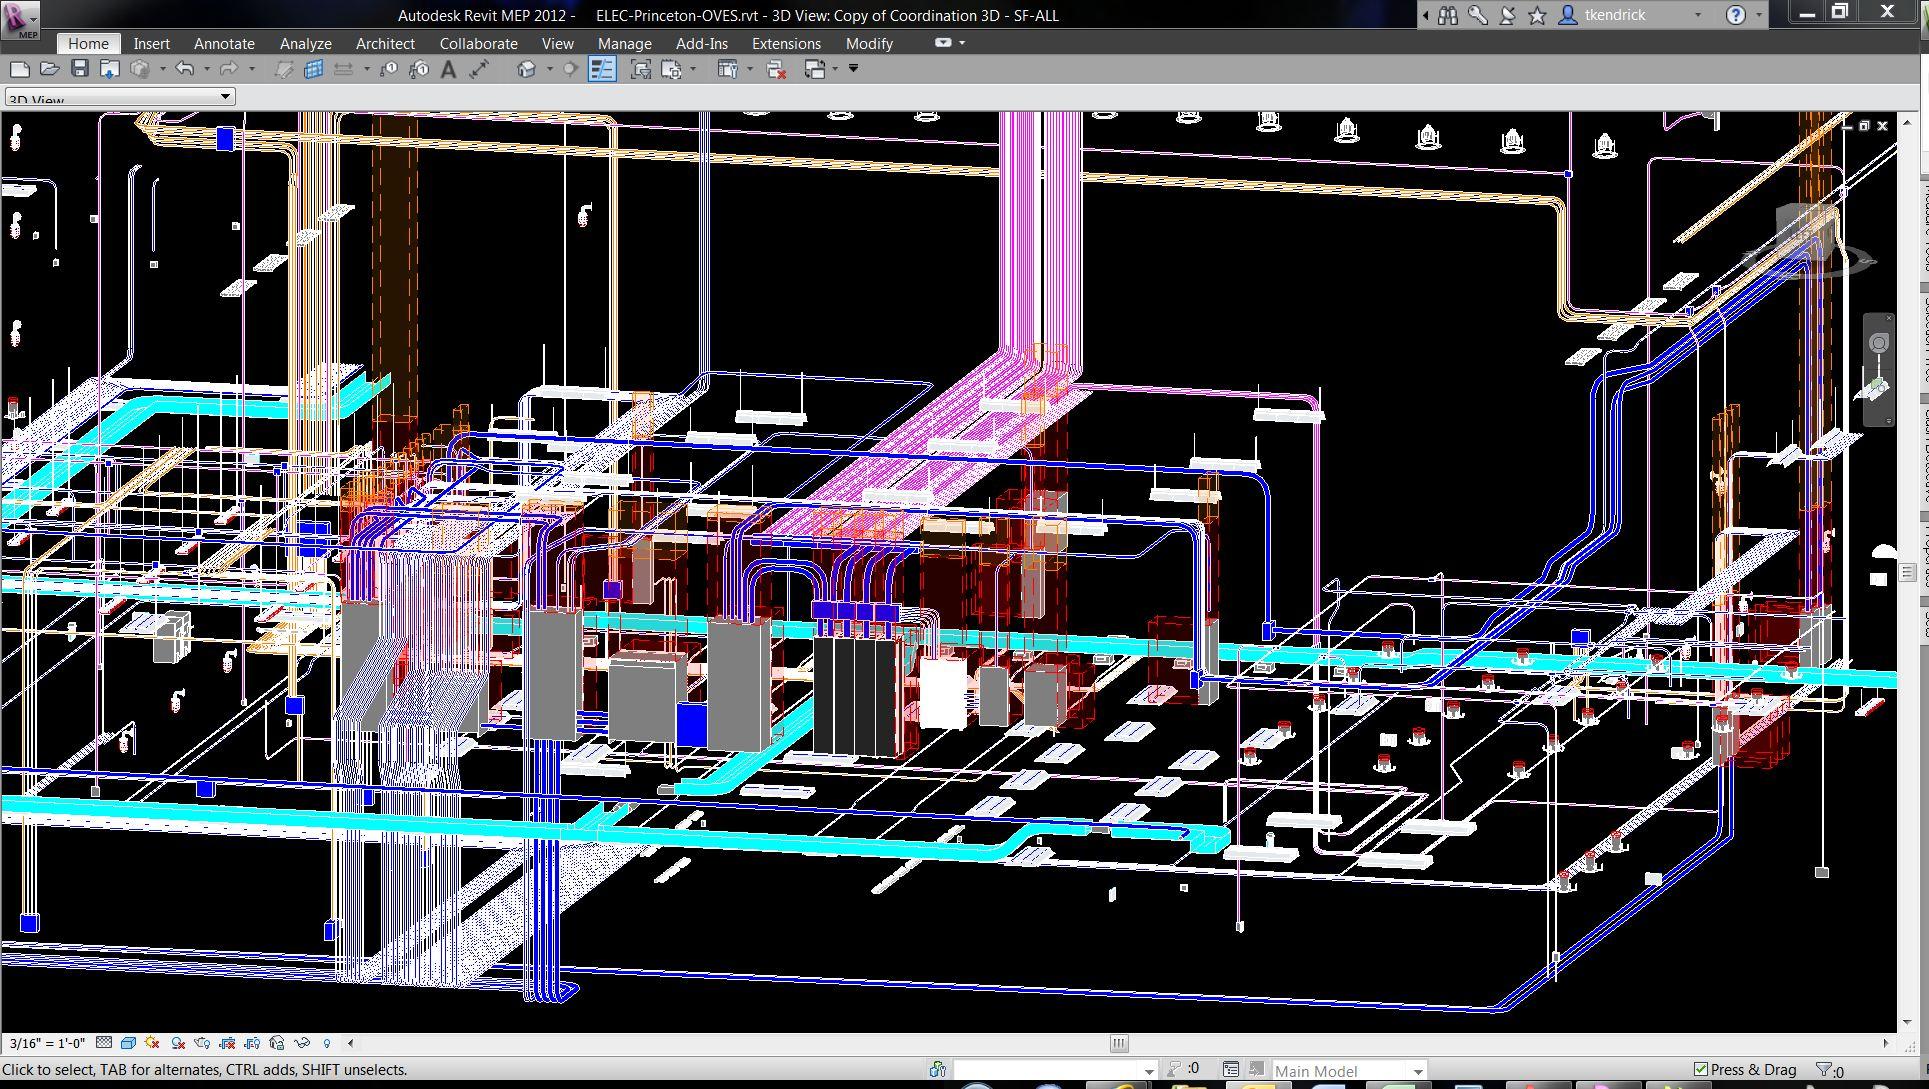 Revit Vs Navisworks For Coordination Autodesk Community